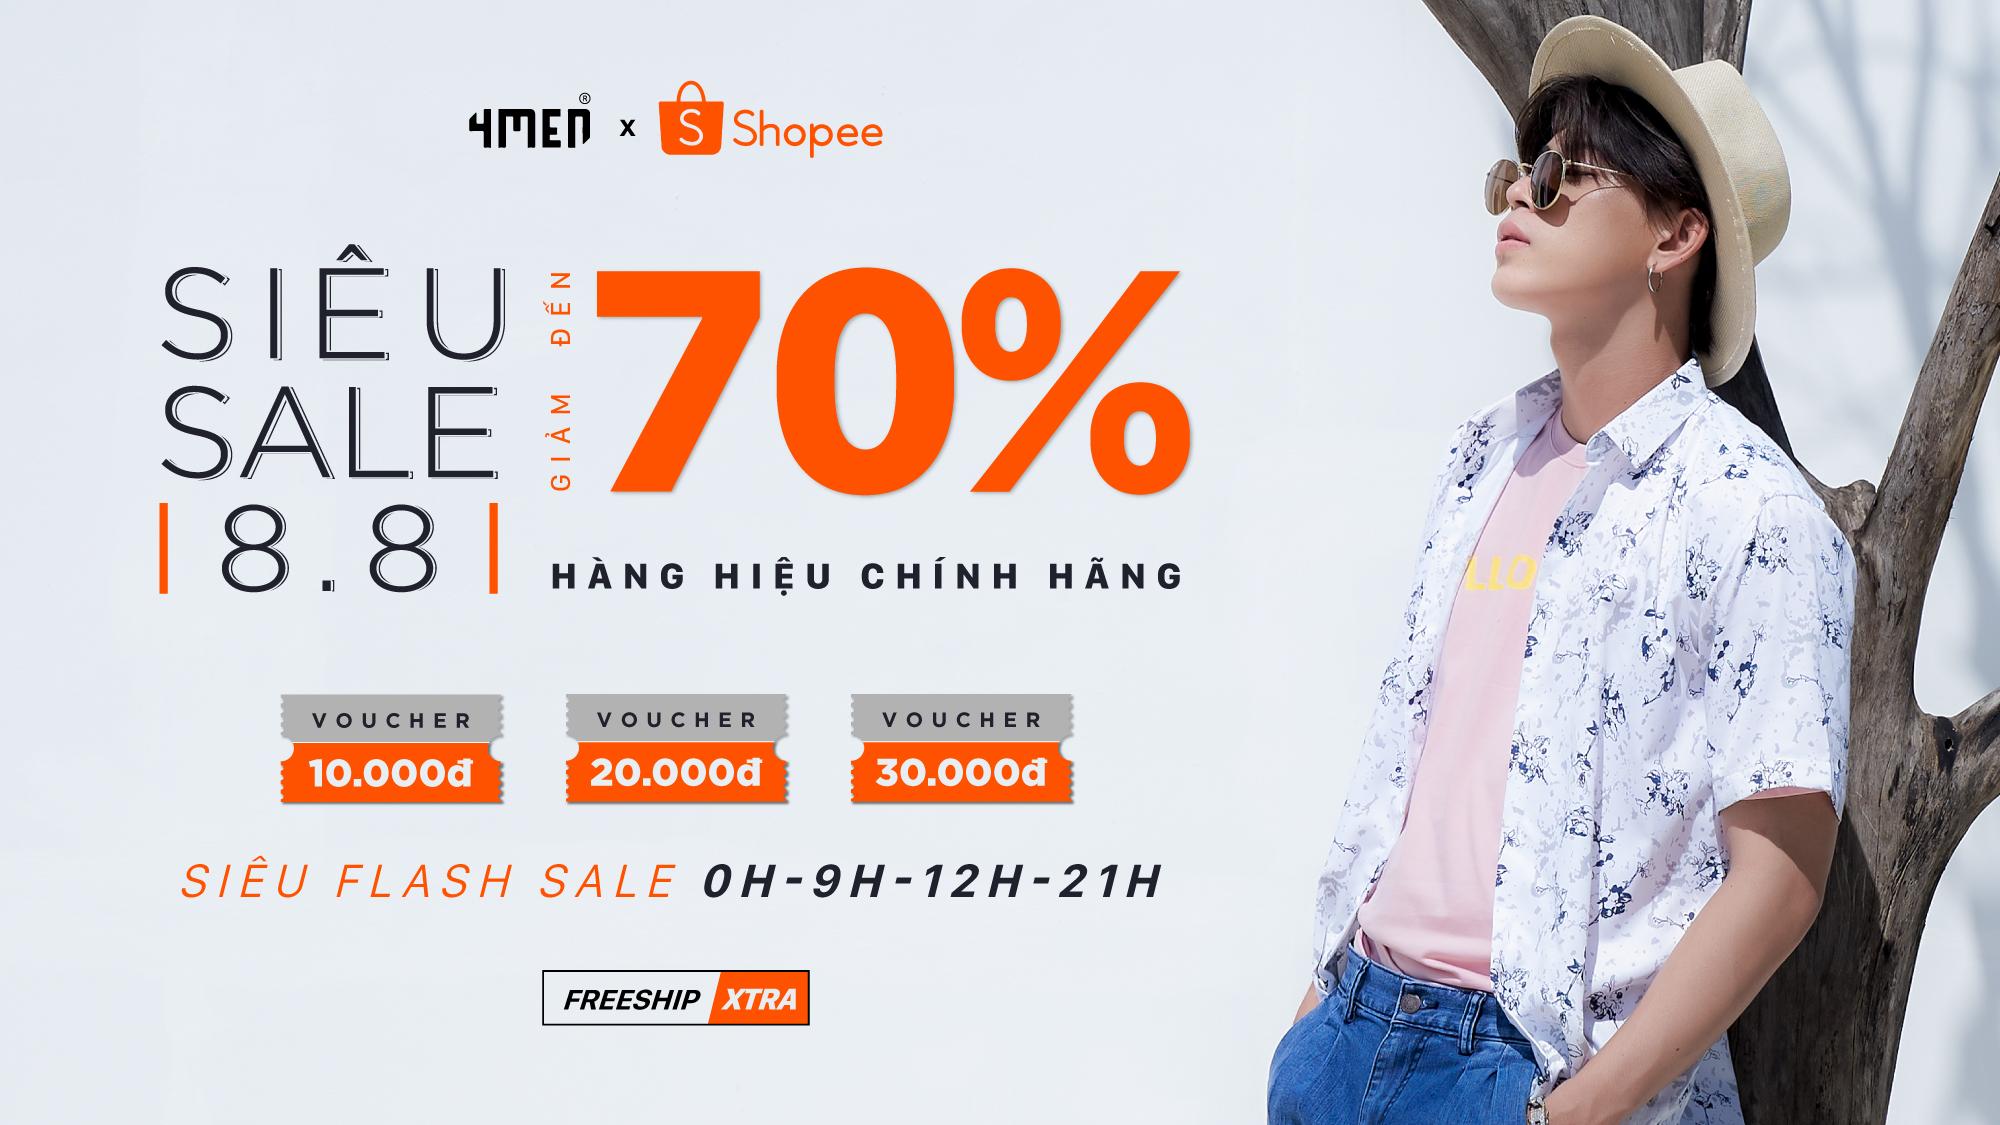 Siêu sale 88 - sale up to 70 - 1